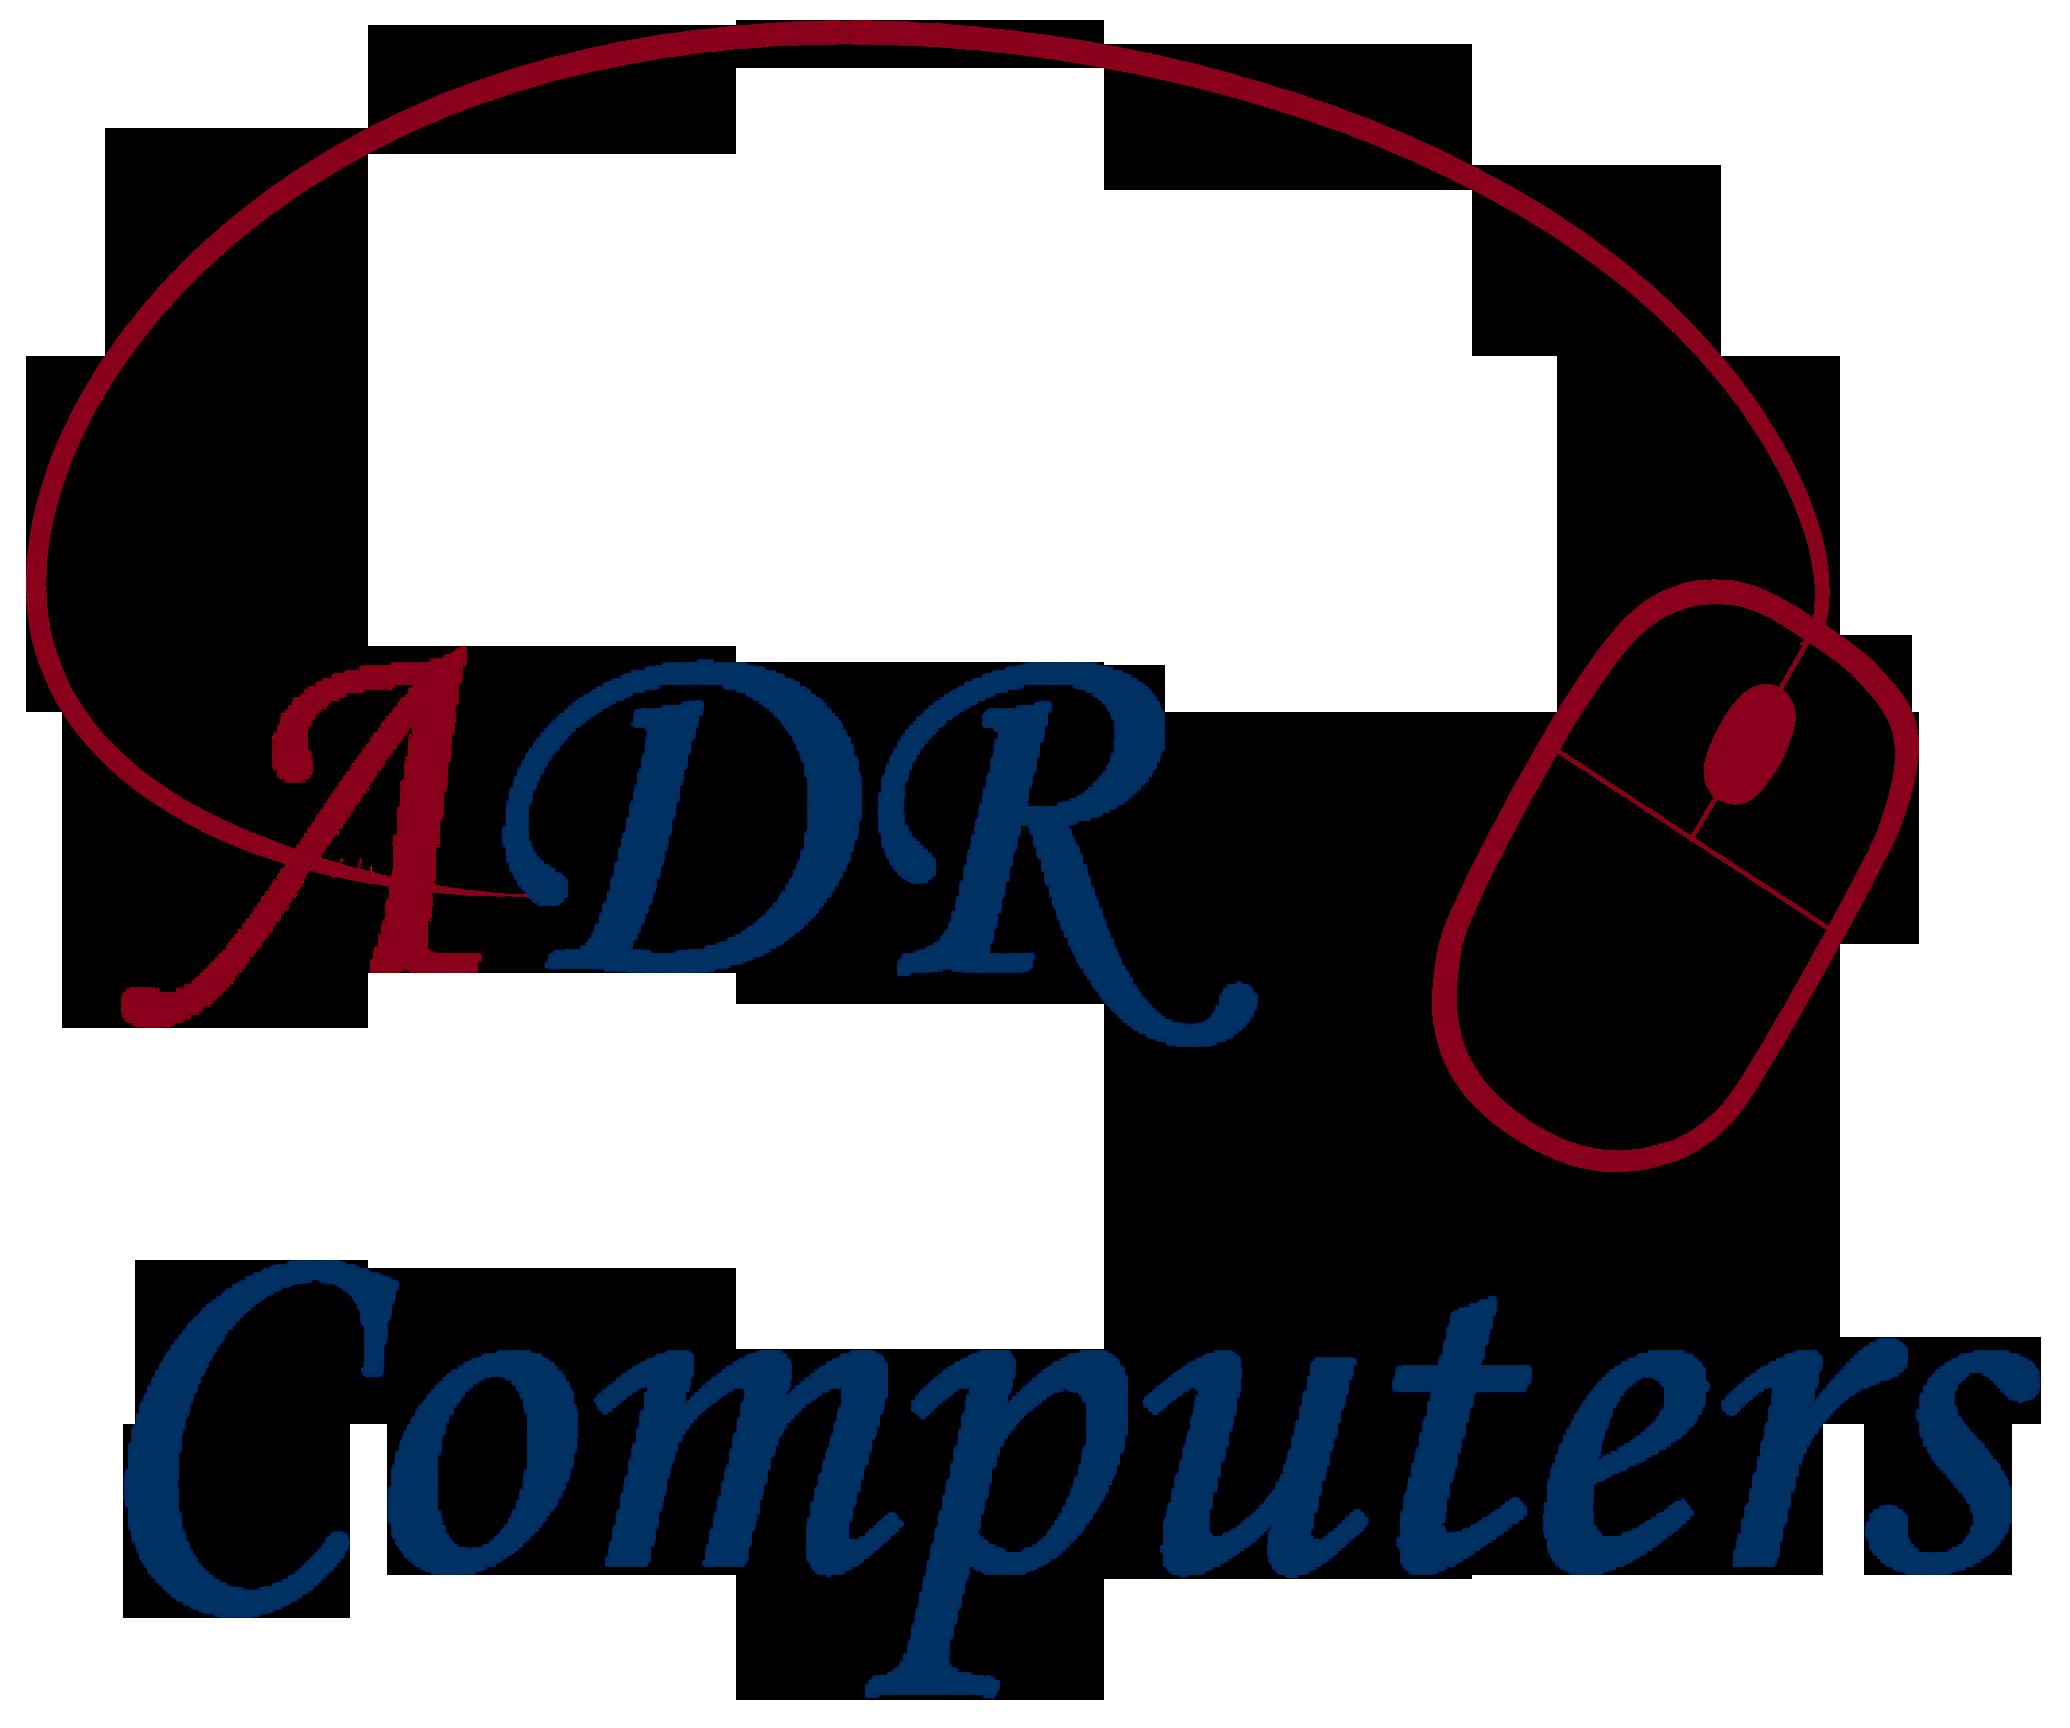 adr-logo-new.png